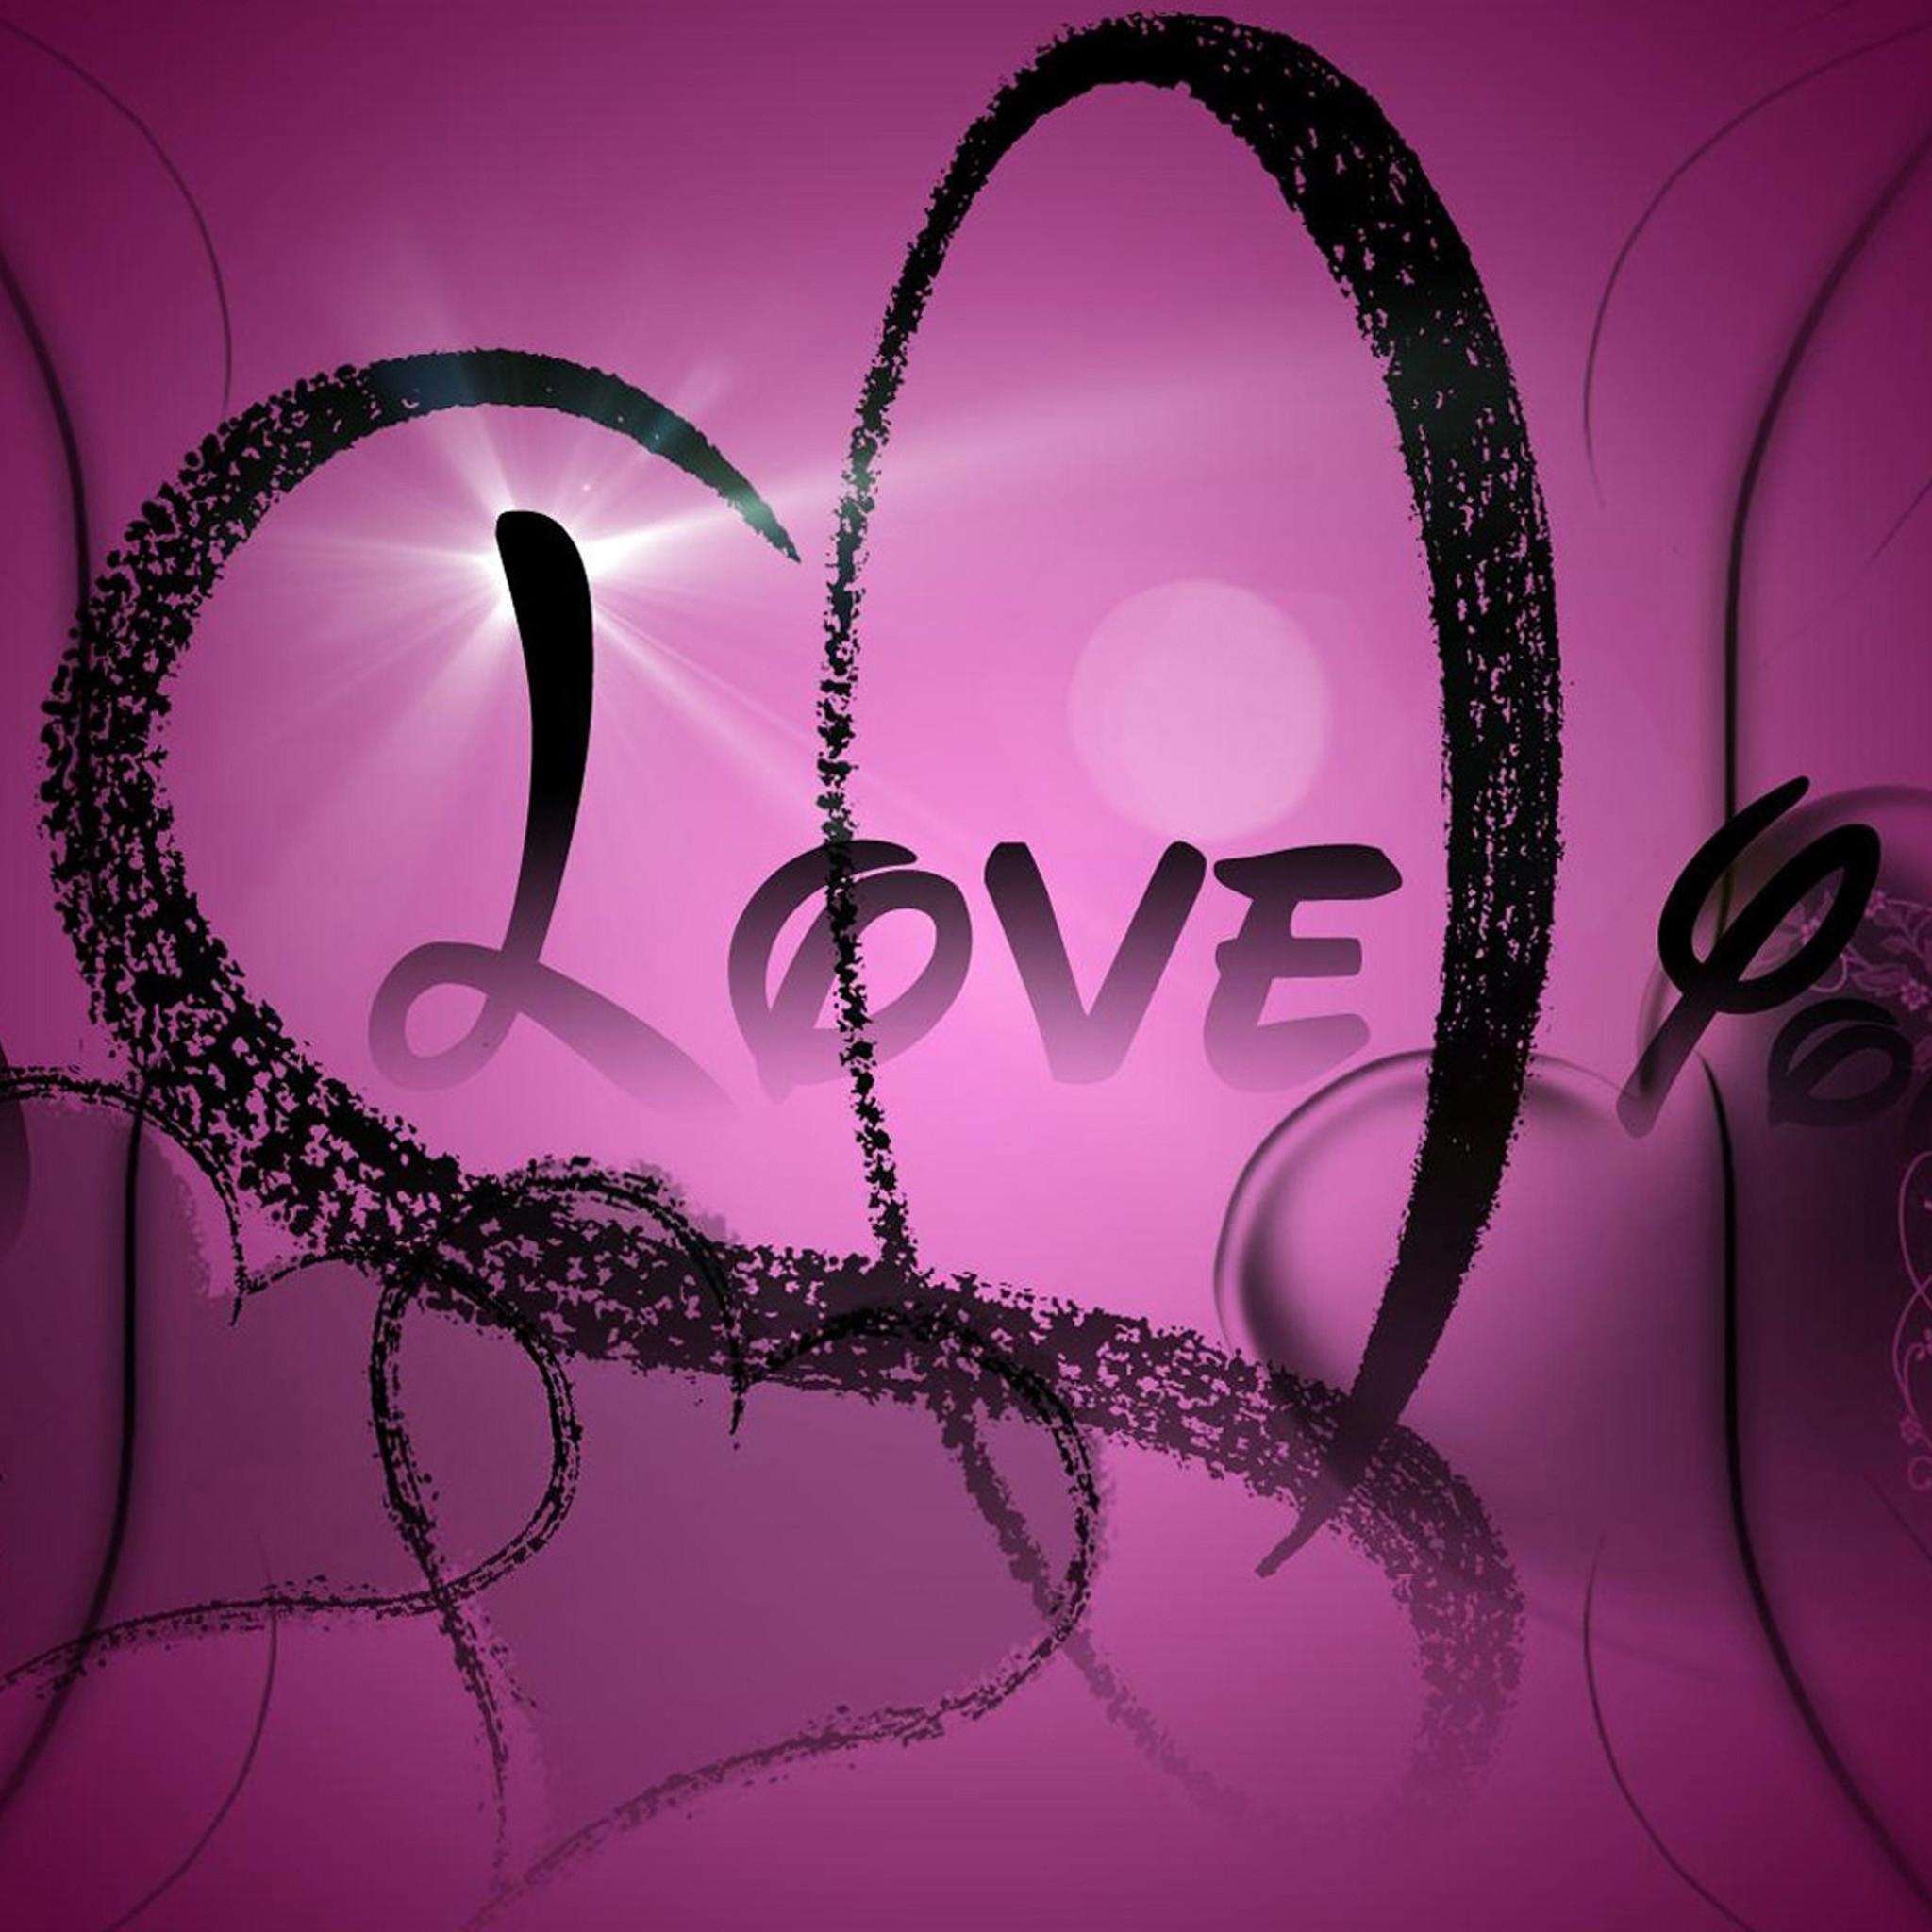 Black love iPad Air 2 Wallpapers